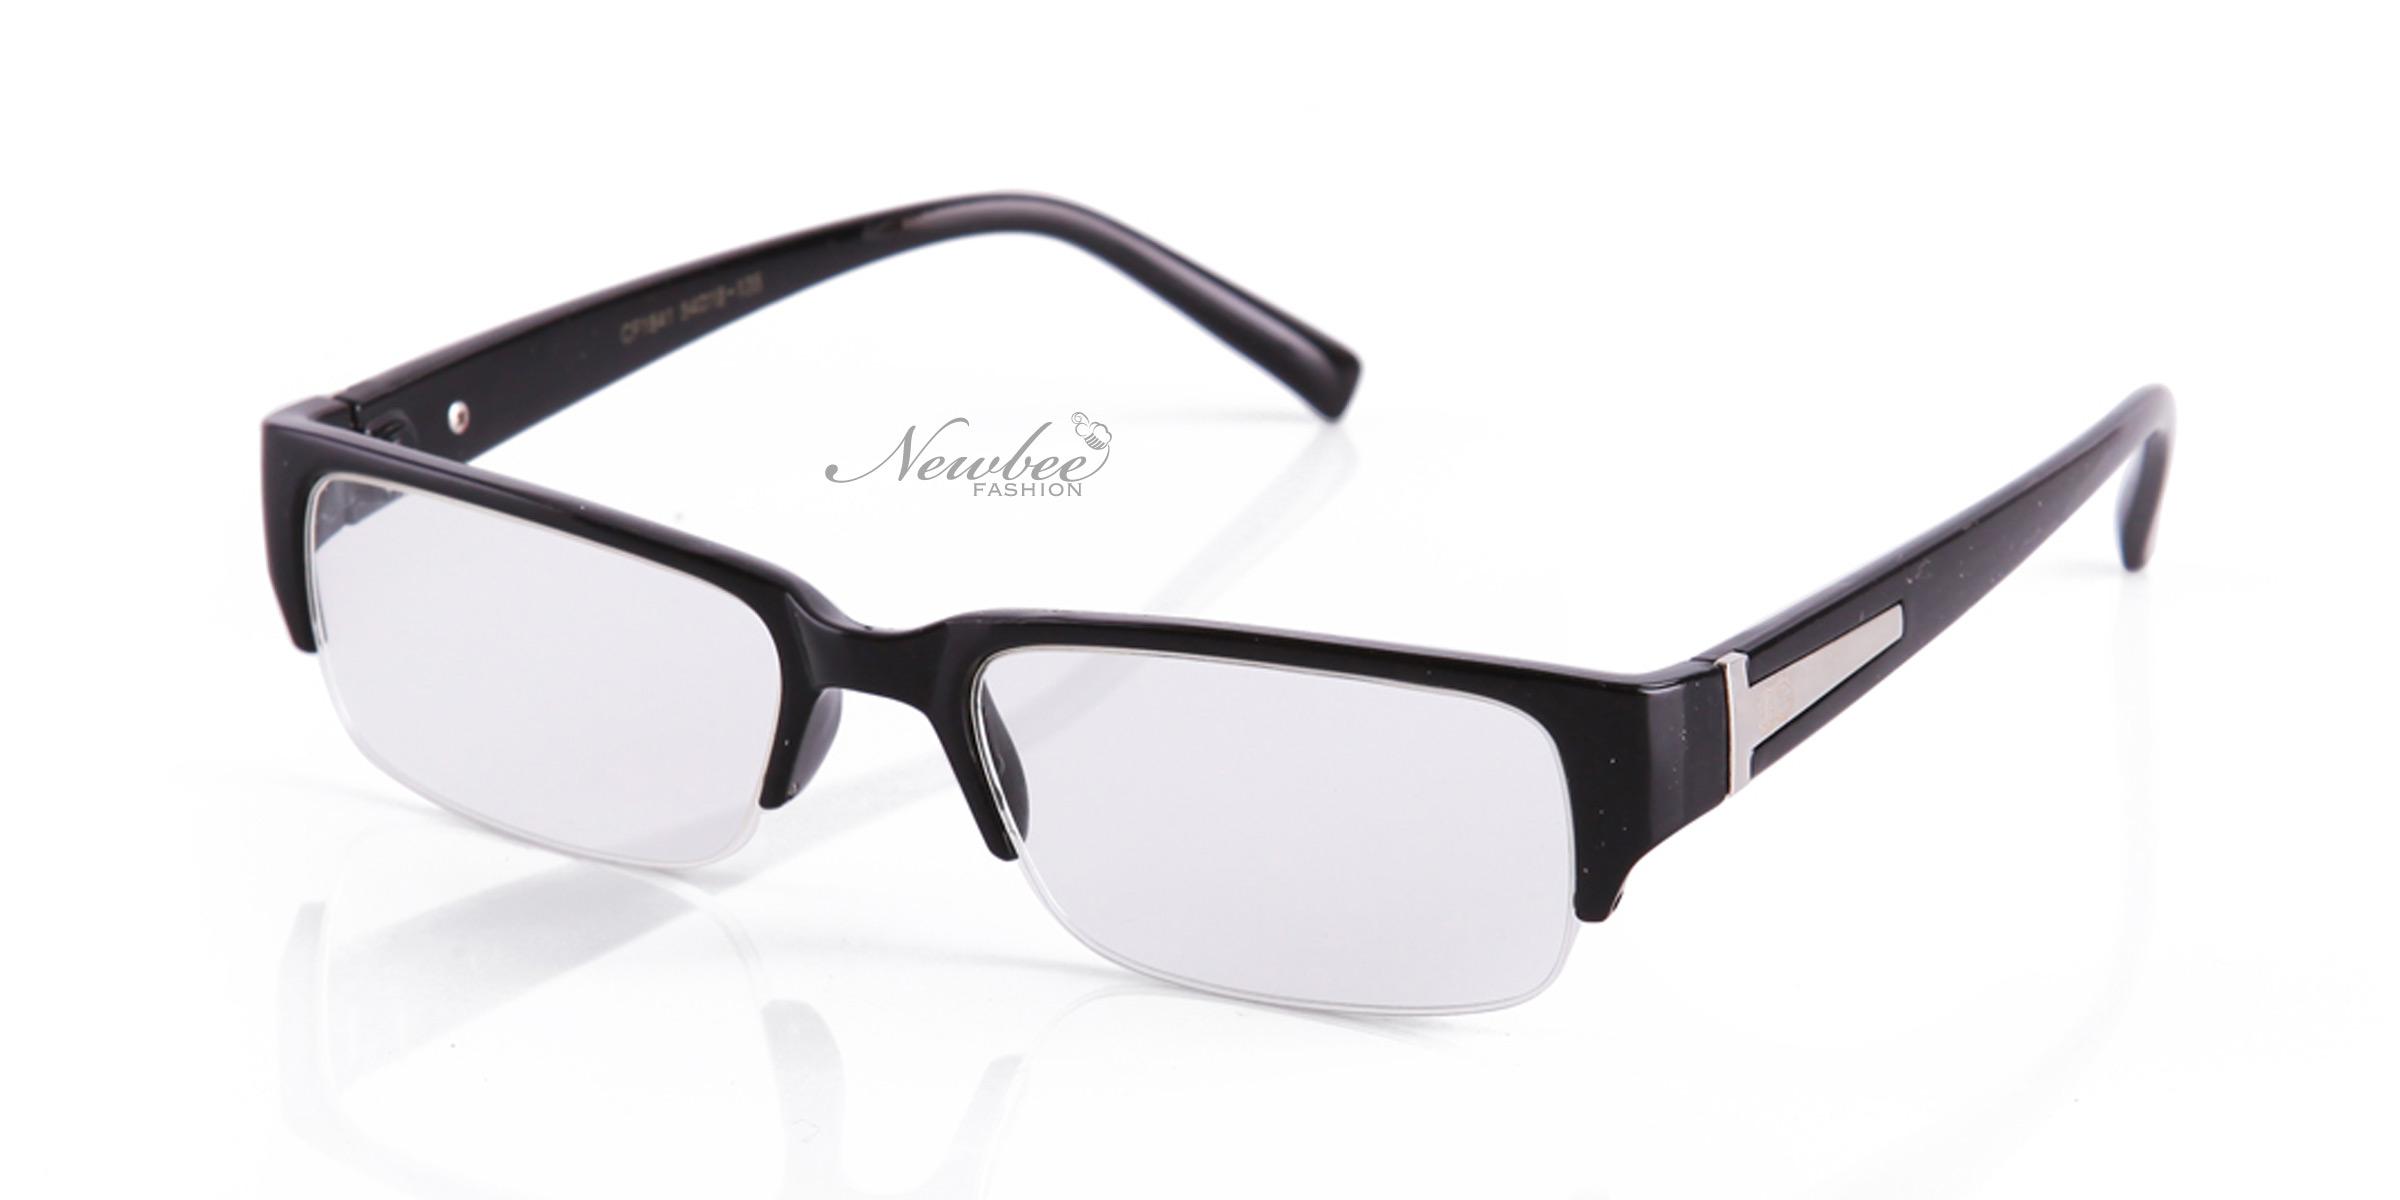 Tortoise Black Half Frame Clear Lens Glasses Fashionable ...